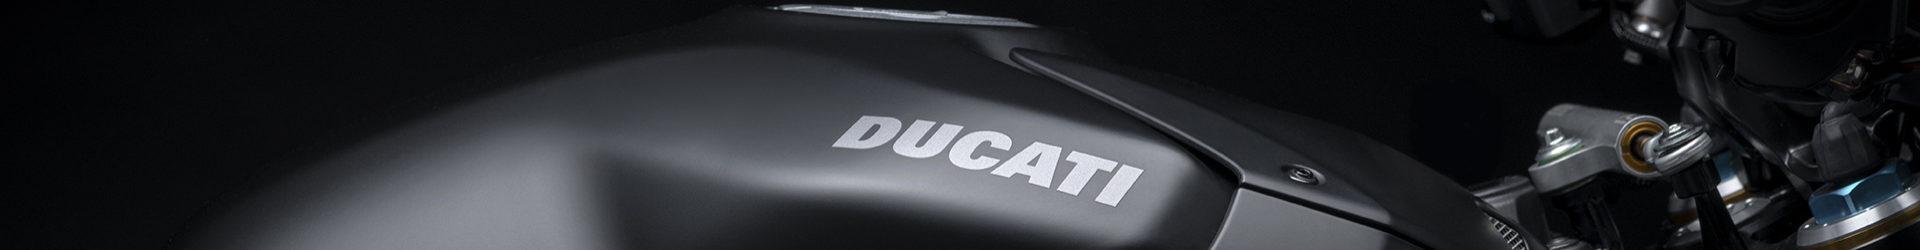 Ducati Saitama